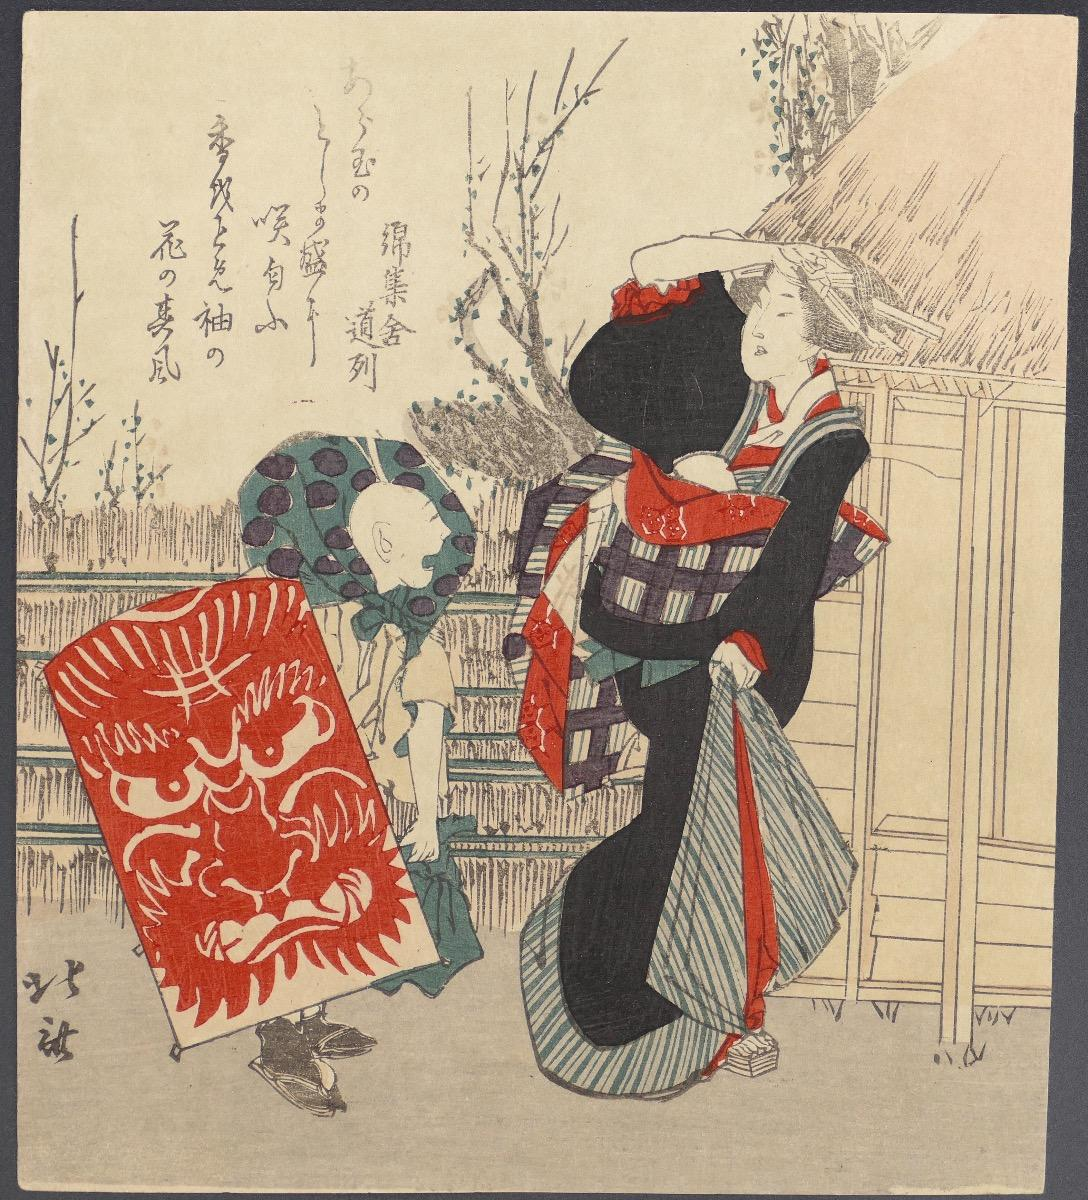 Kite - Original Woodblock by Katsushika Hokusai - Mid 19th Century